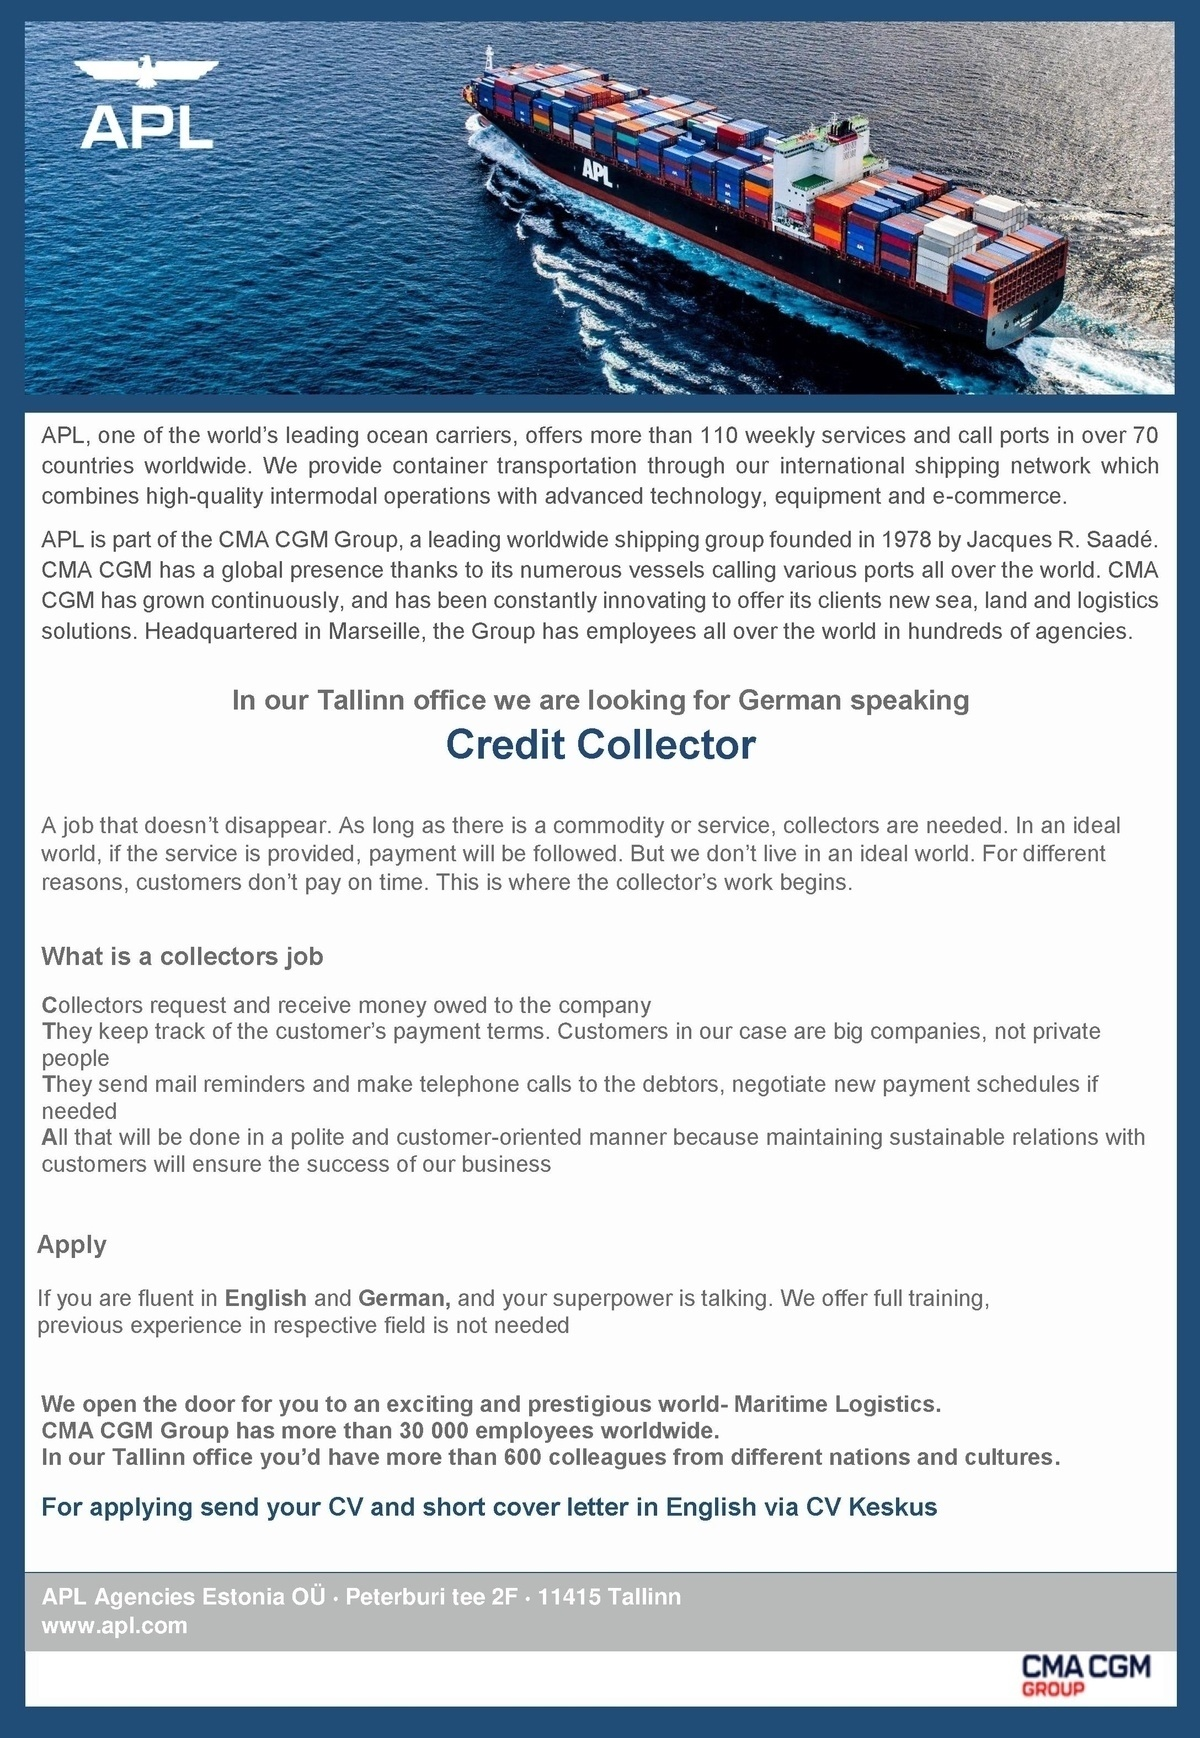 cv keskus t u00f6 u00f6pakkumine credit collector